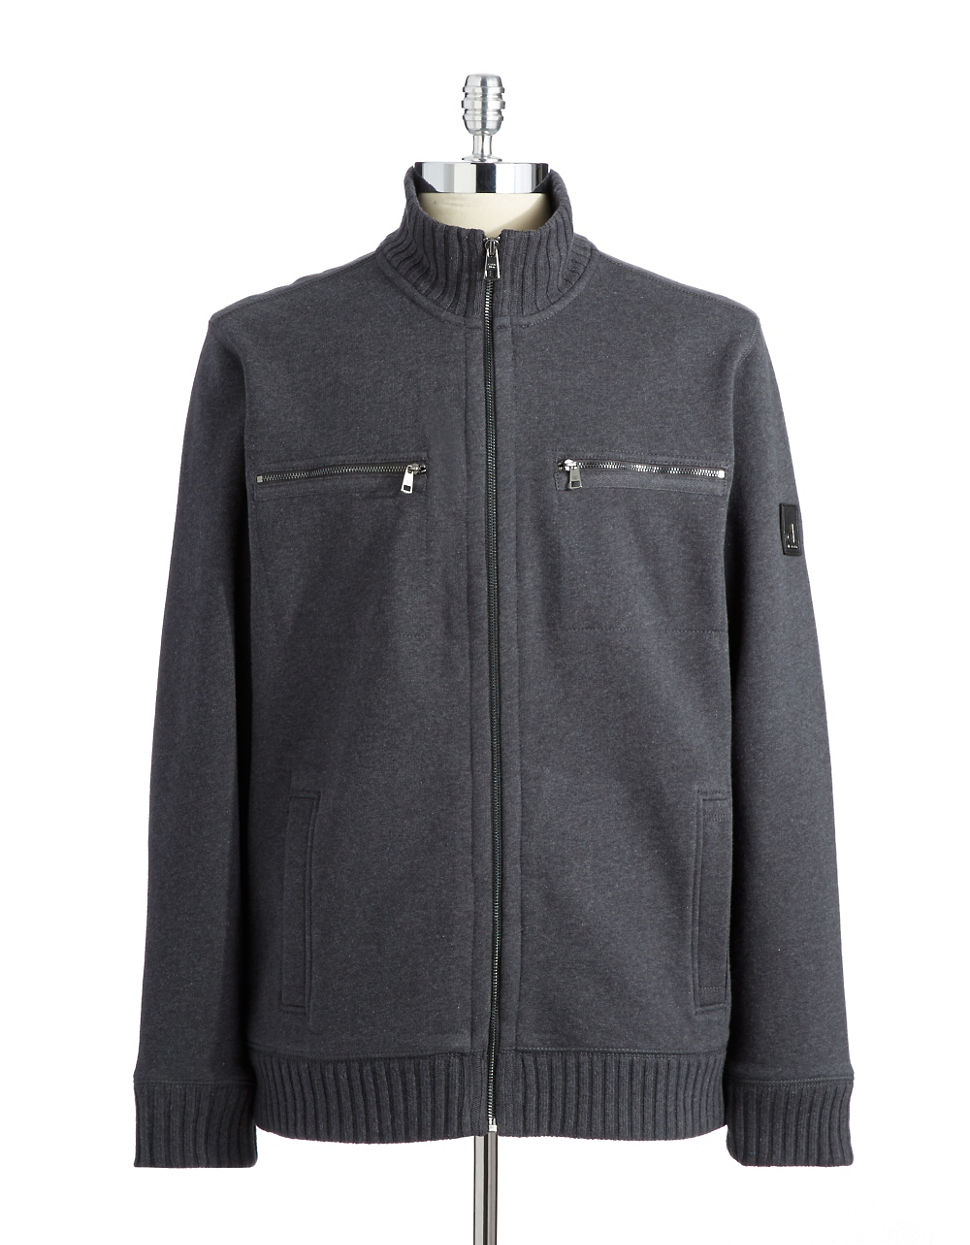 lyst calvin klein zip up sweater in gray for men. Black Bedroom Furniture Sets. Home Design Ideas